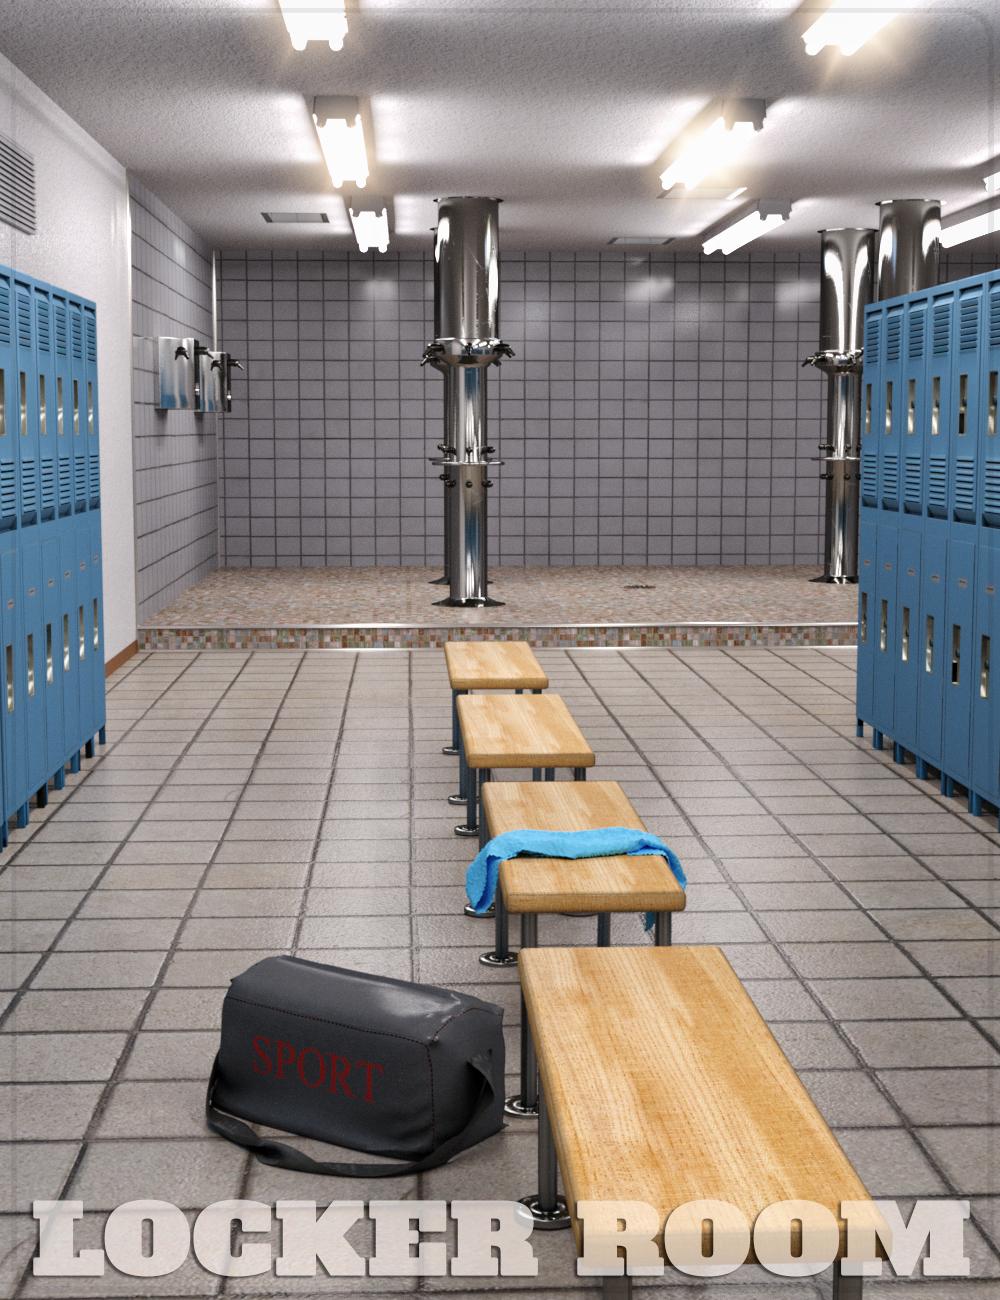 FG Locker Room by: Fugazi1968, 3D Models by Daz 3D